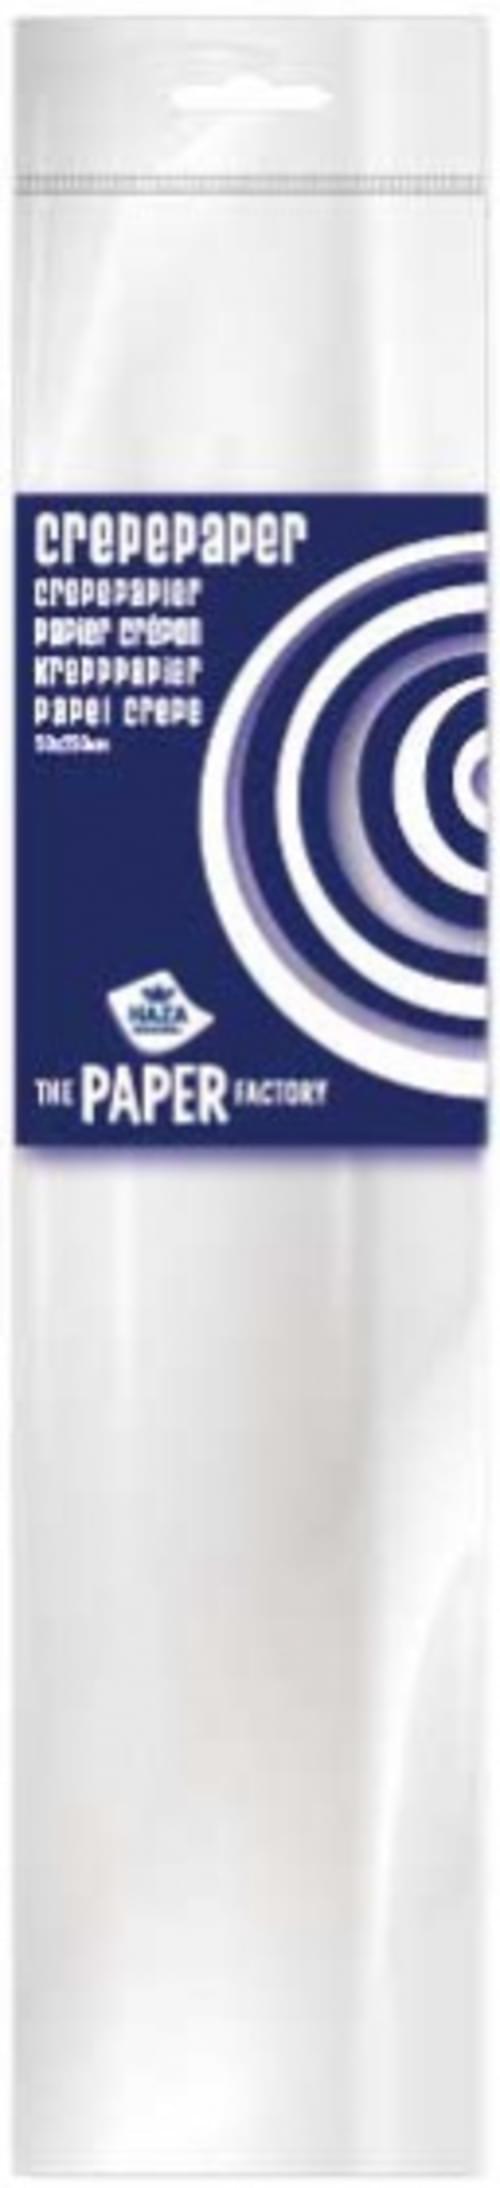 Haza Crepe Paper - White